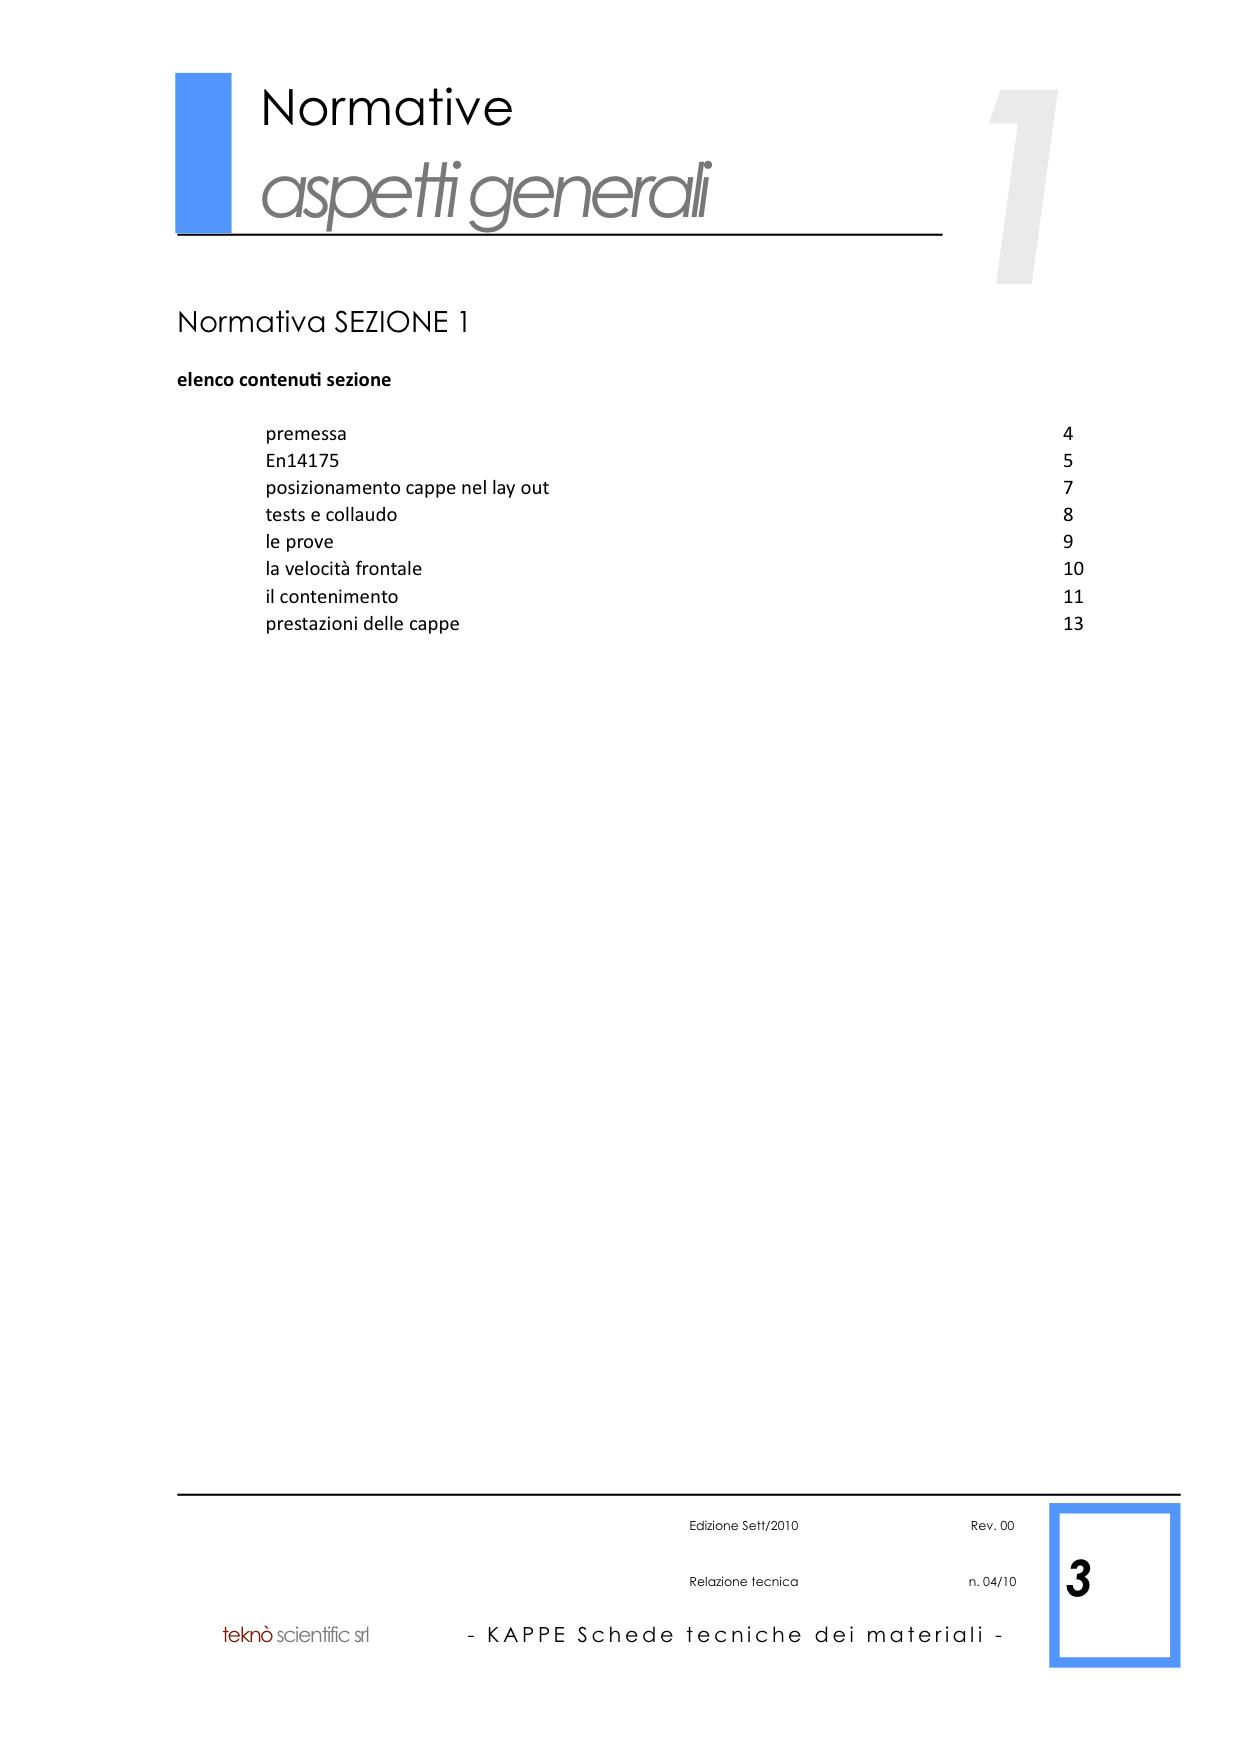 KAPPE Schede tecniche materiali copia 3.png